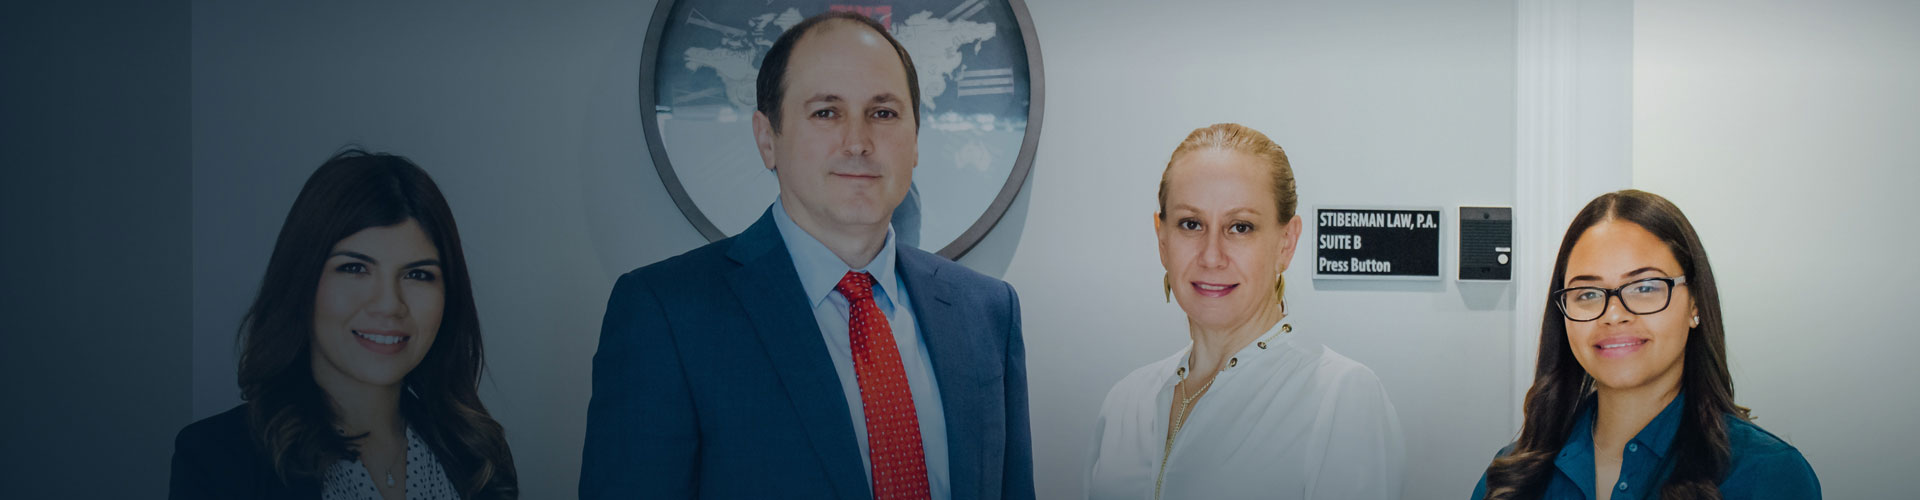 Loan Modification Attorneys - Stiberman Law Firm